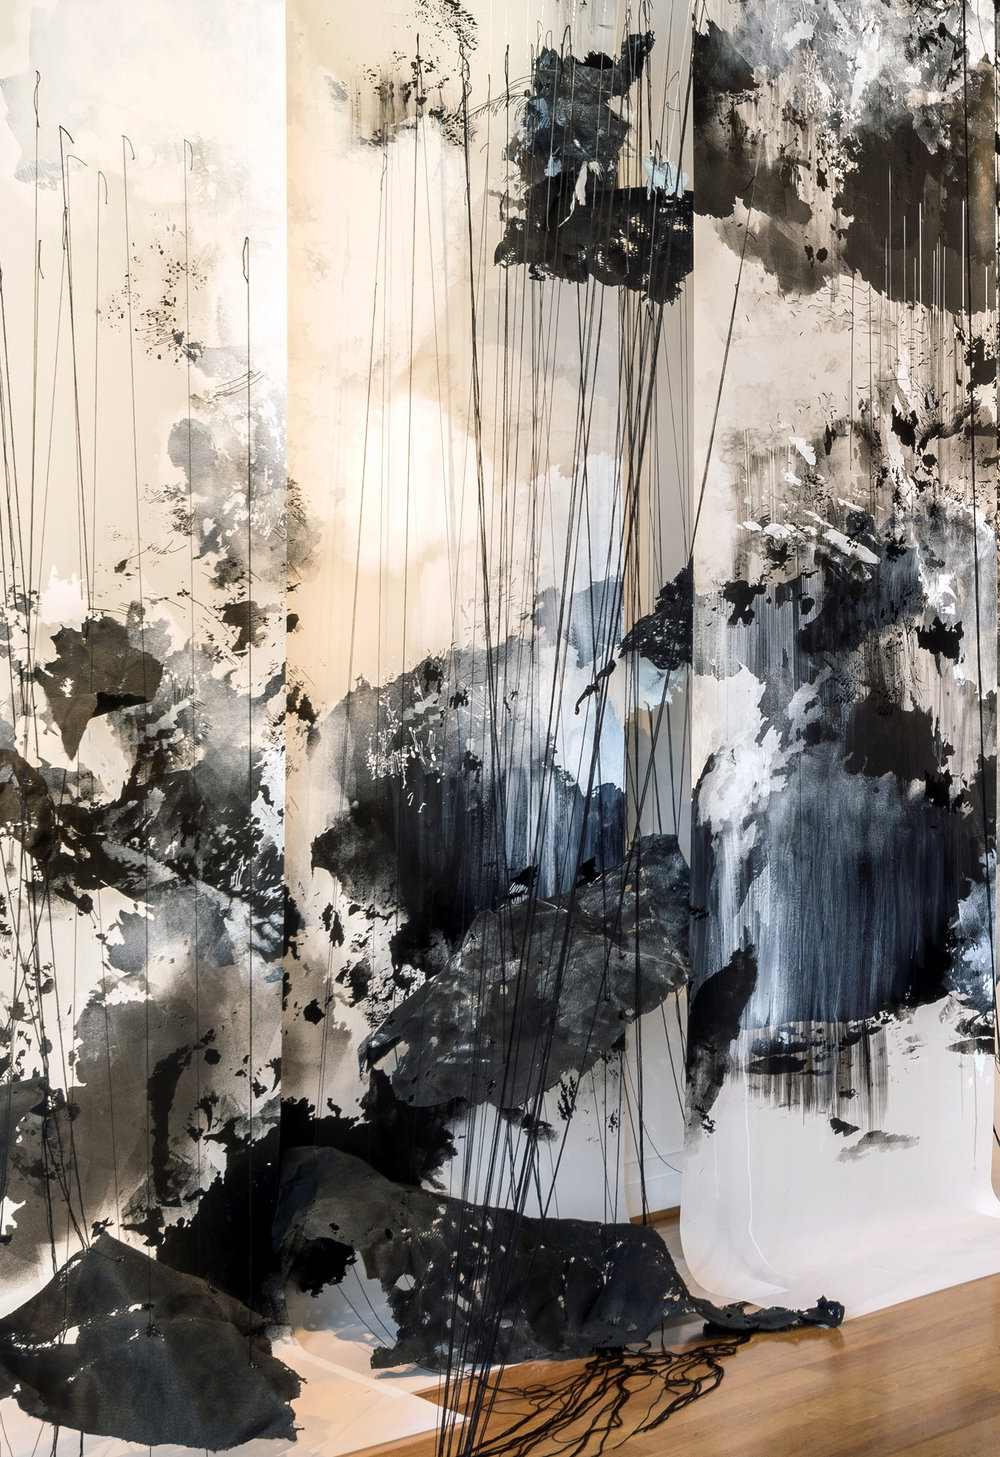 Vanishing Point  (Feb. 28, 2015, 11:41 am, Chesapeake Bay-  Jan. 12, 2017, 11:32 am, Alsek Glacier, Yukon)  2017  Acrylic paint, markers, thread, monofilament, felt, mylar  11 x 17 x 6 ft